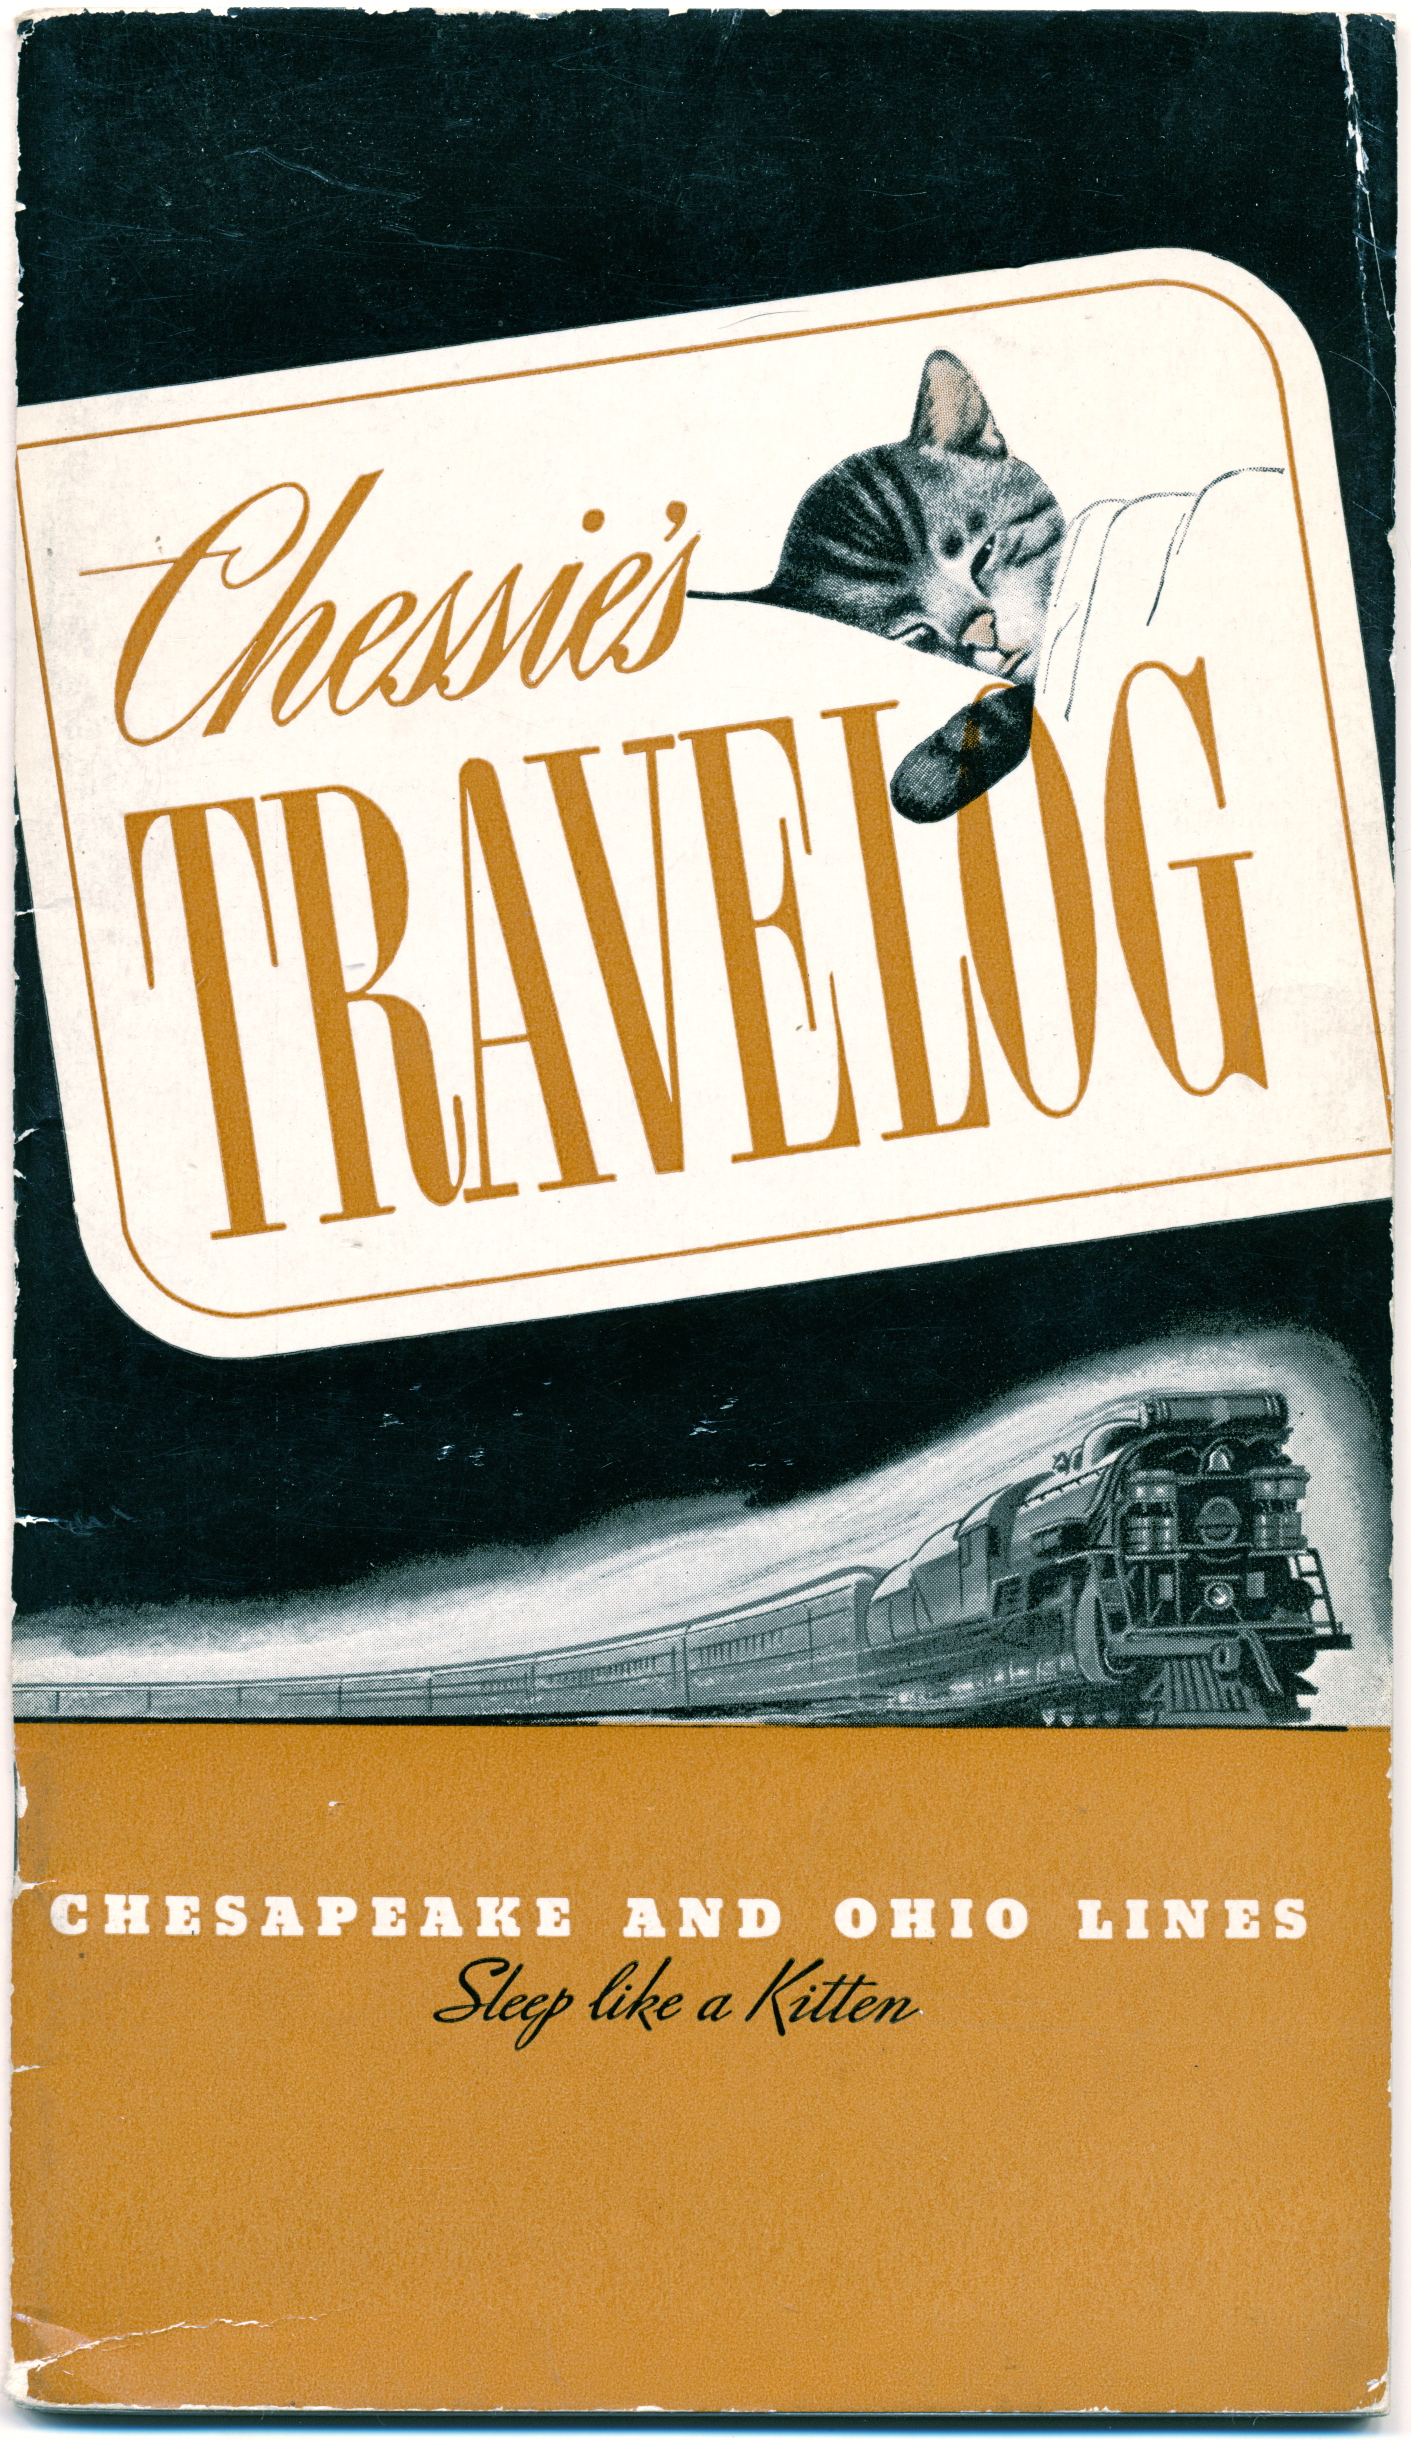 Chesapeake and Ohio Railway - 1940